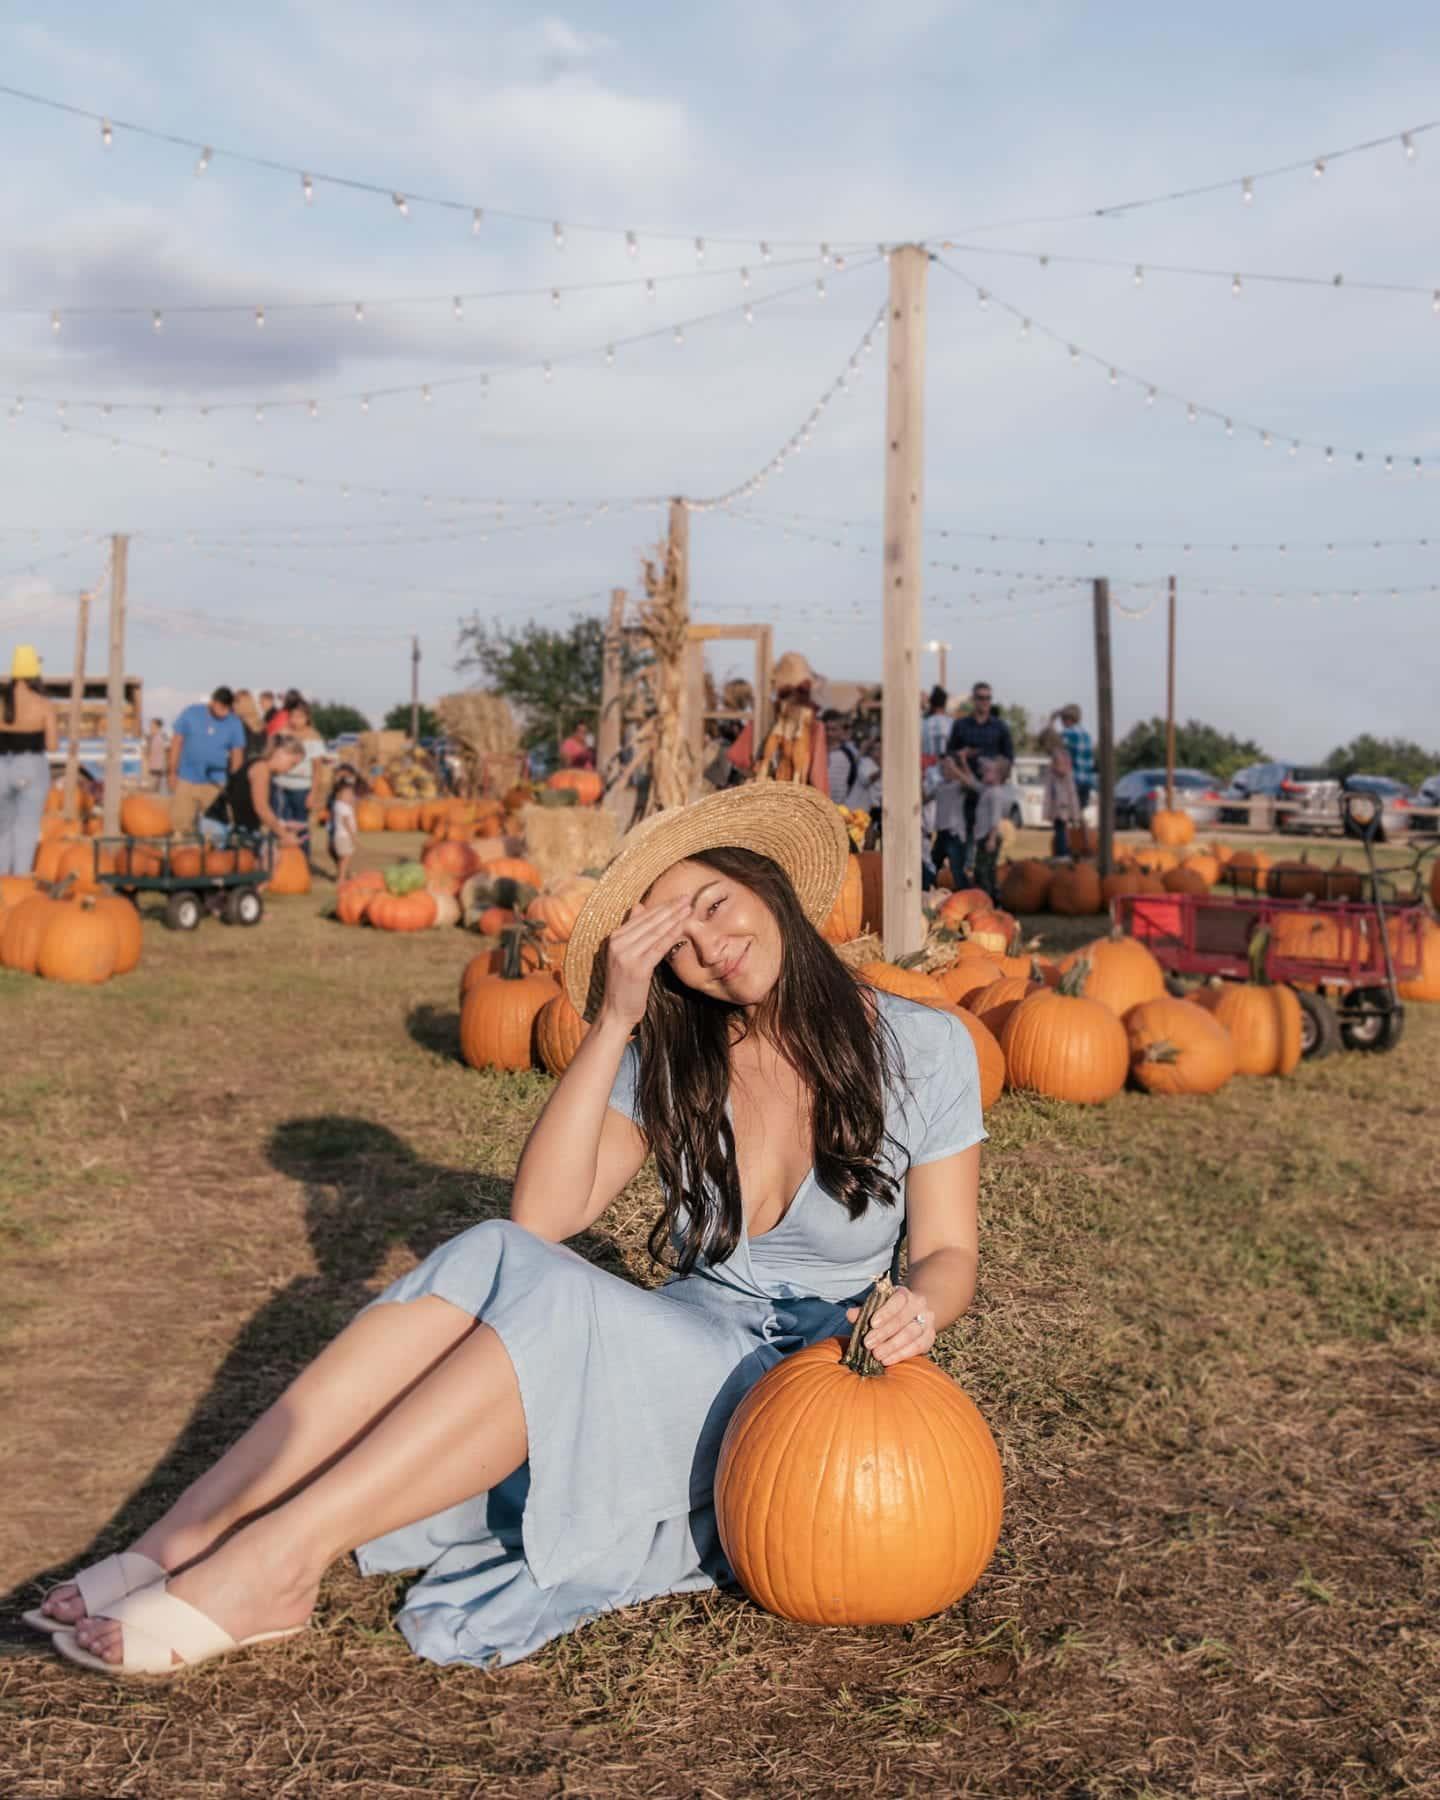 What You'll Find at Halls Pumpkin Farm